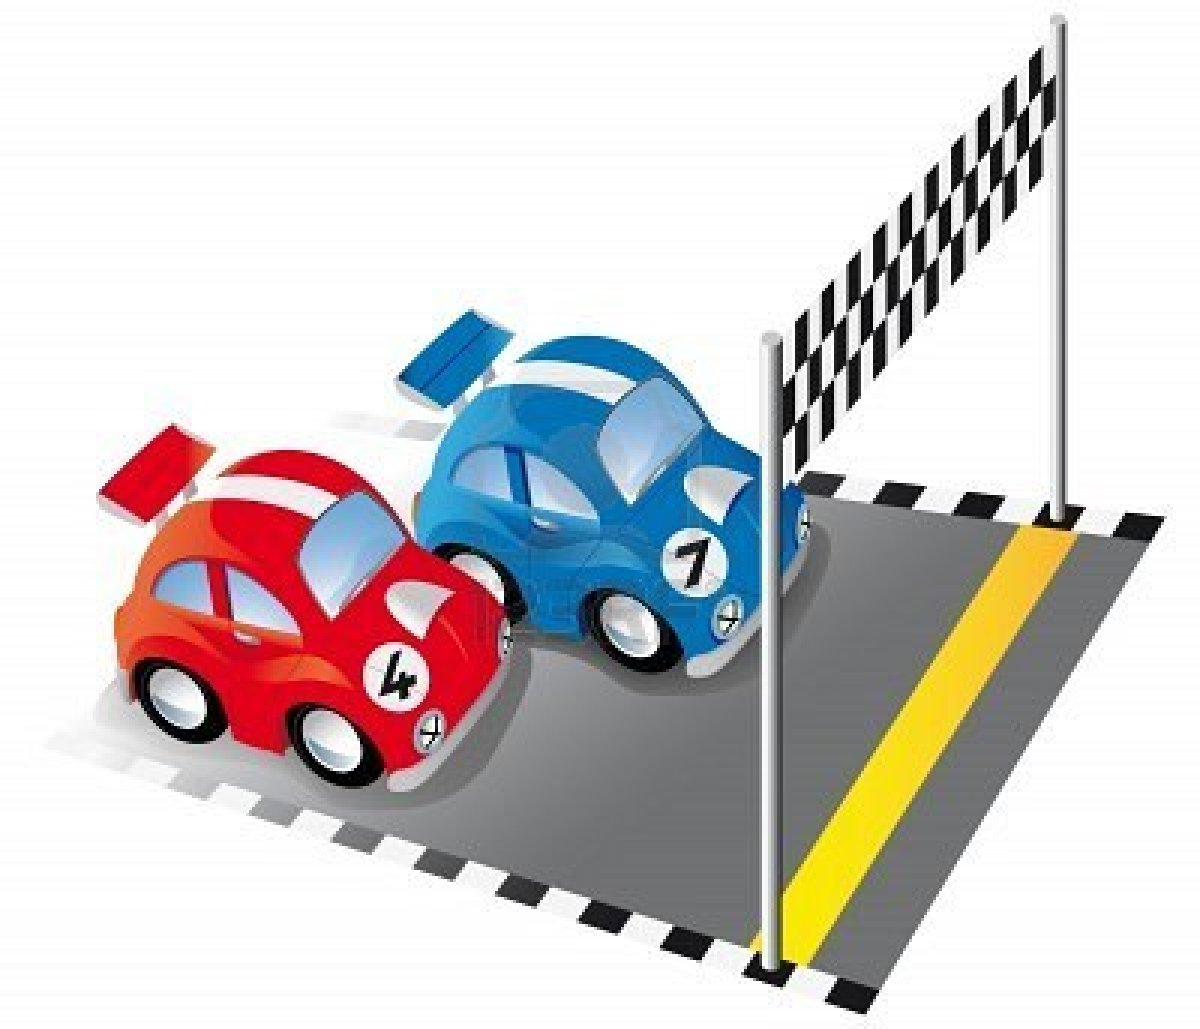 1200x1029 Racing Cartoon Race Car Clipart Clip Art And 2 Wikiclipart 2